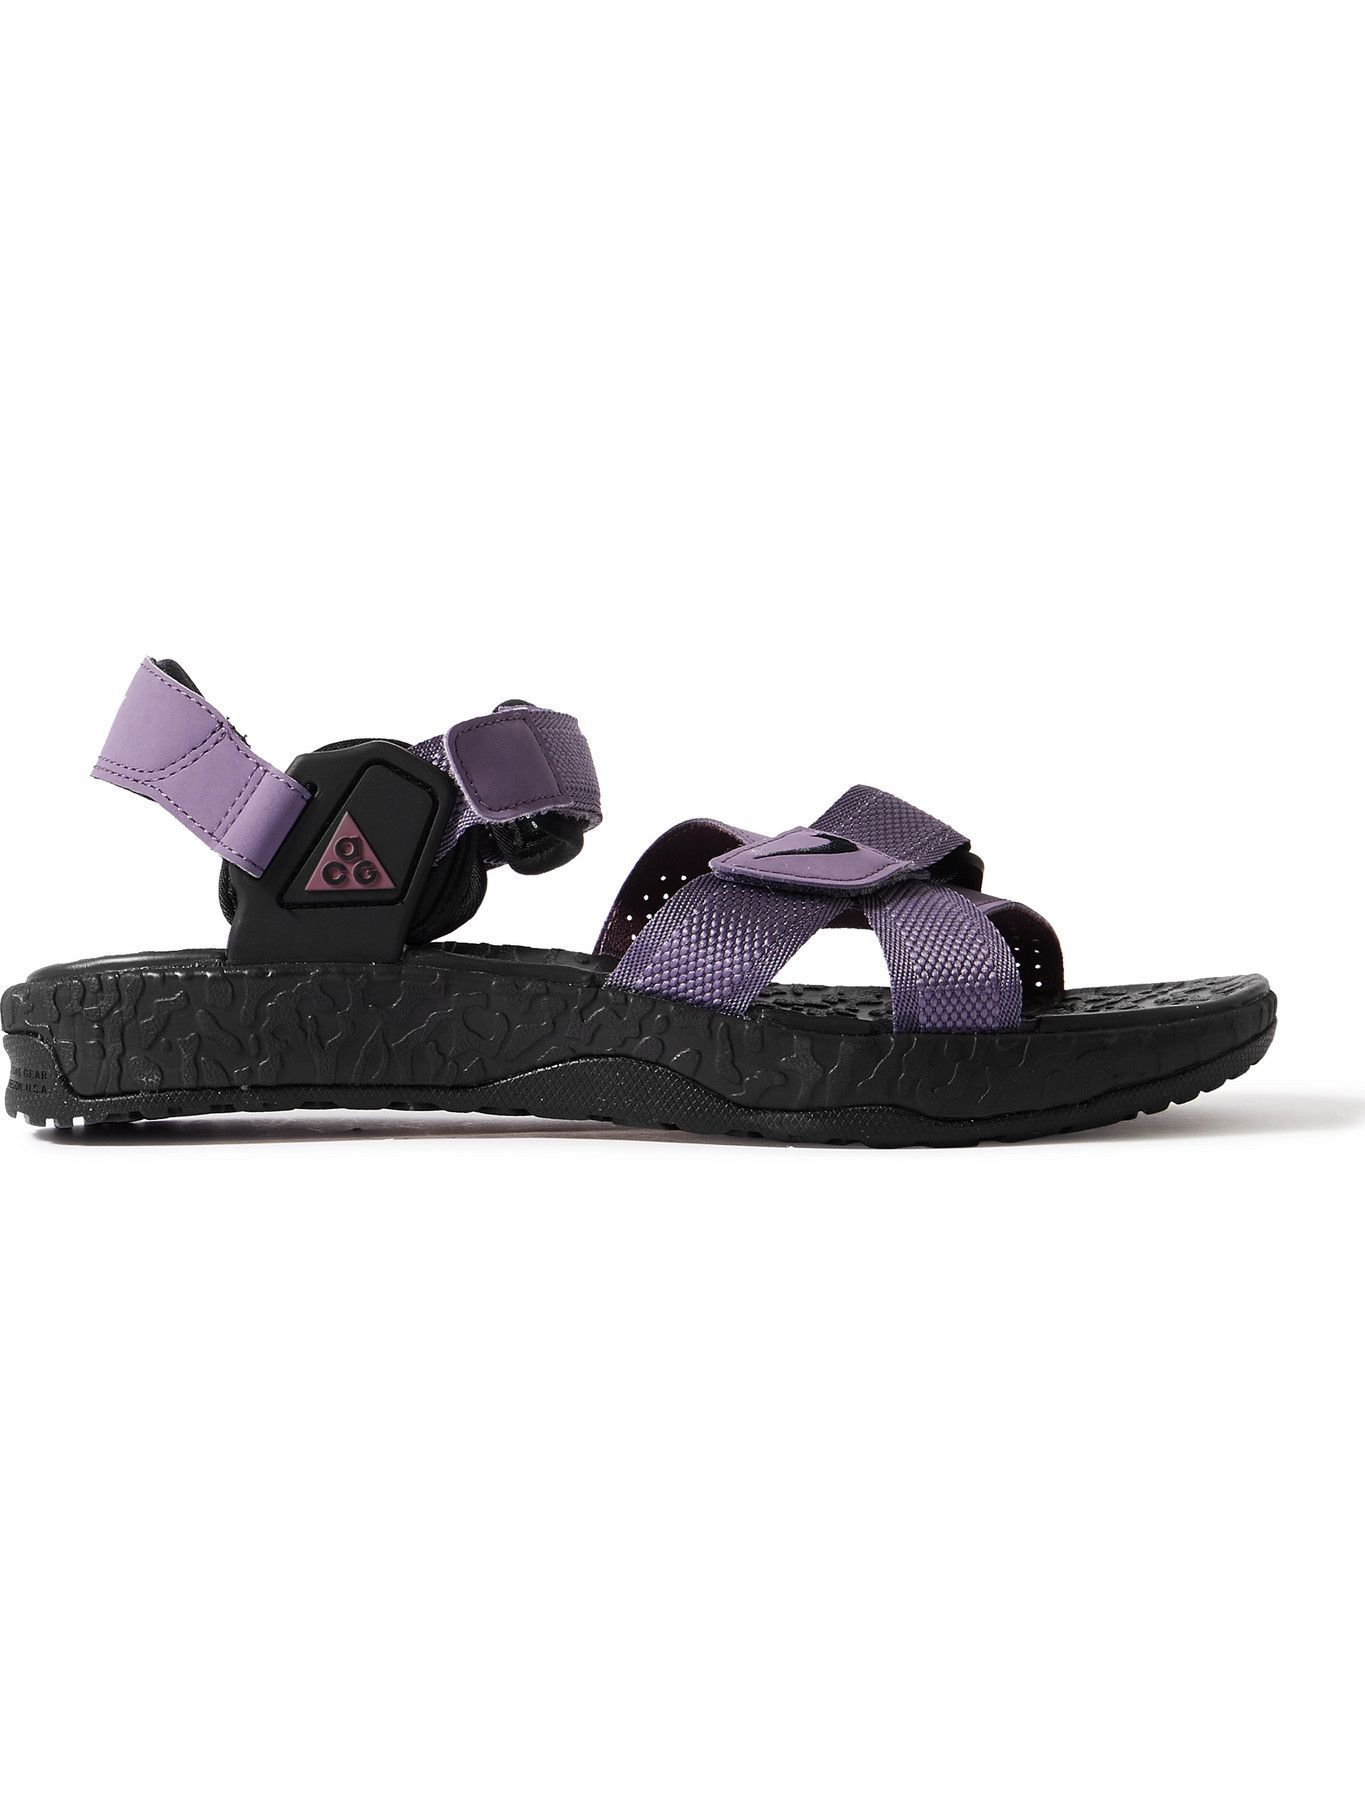 Photo: Nike - ACG Air Deschutz Nylon, Rubber and Neoprene Sandals - Purple